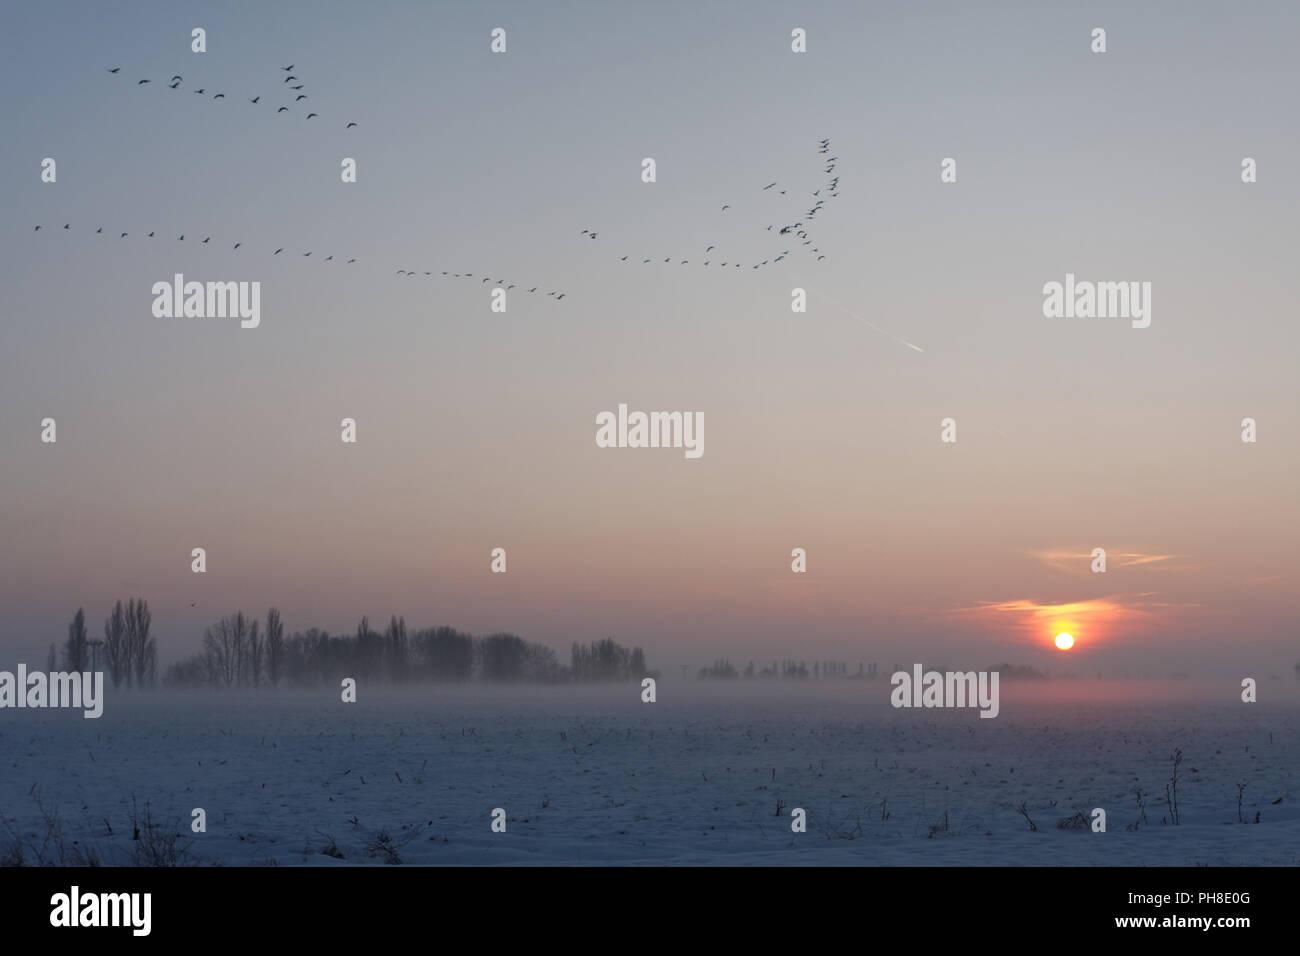 Vögel in der Abenddämmerung in Axien. Stock Photo